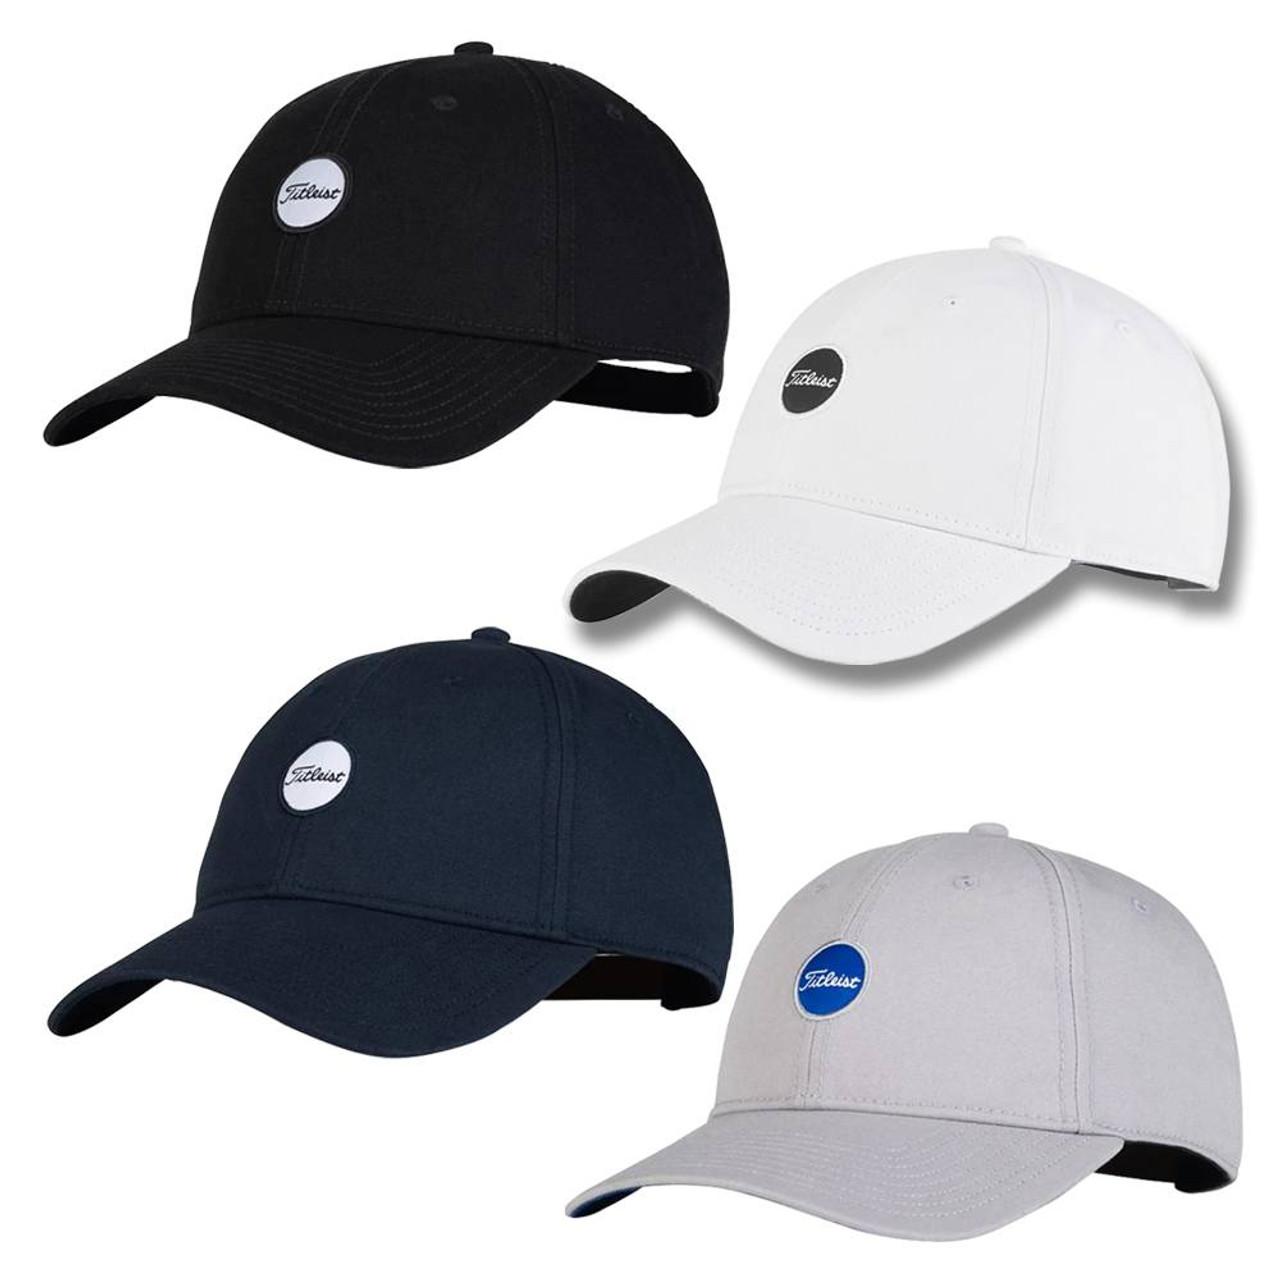 Titleist Golf Montauk Cap